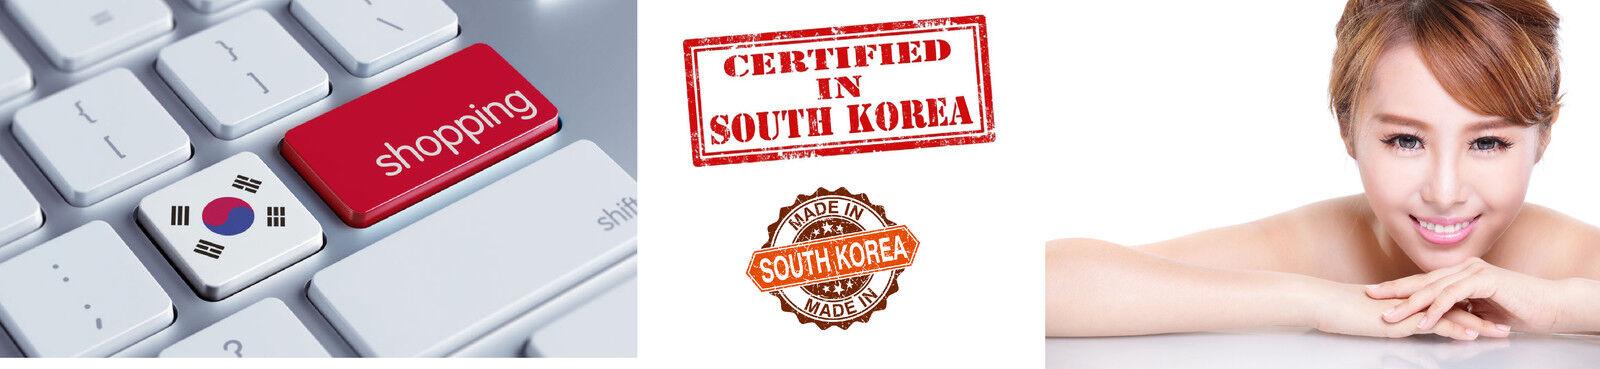 The Buy Korea